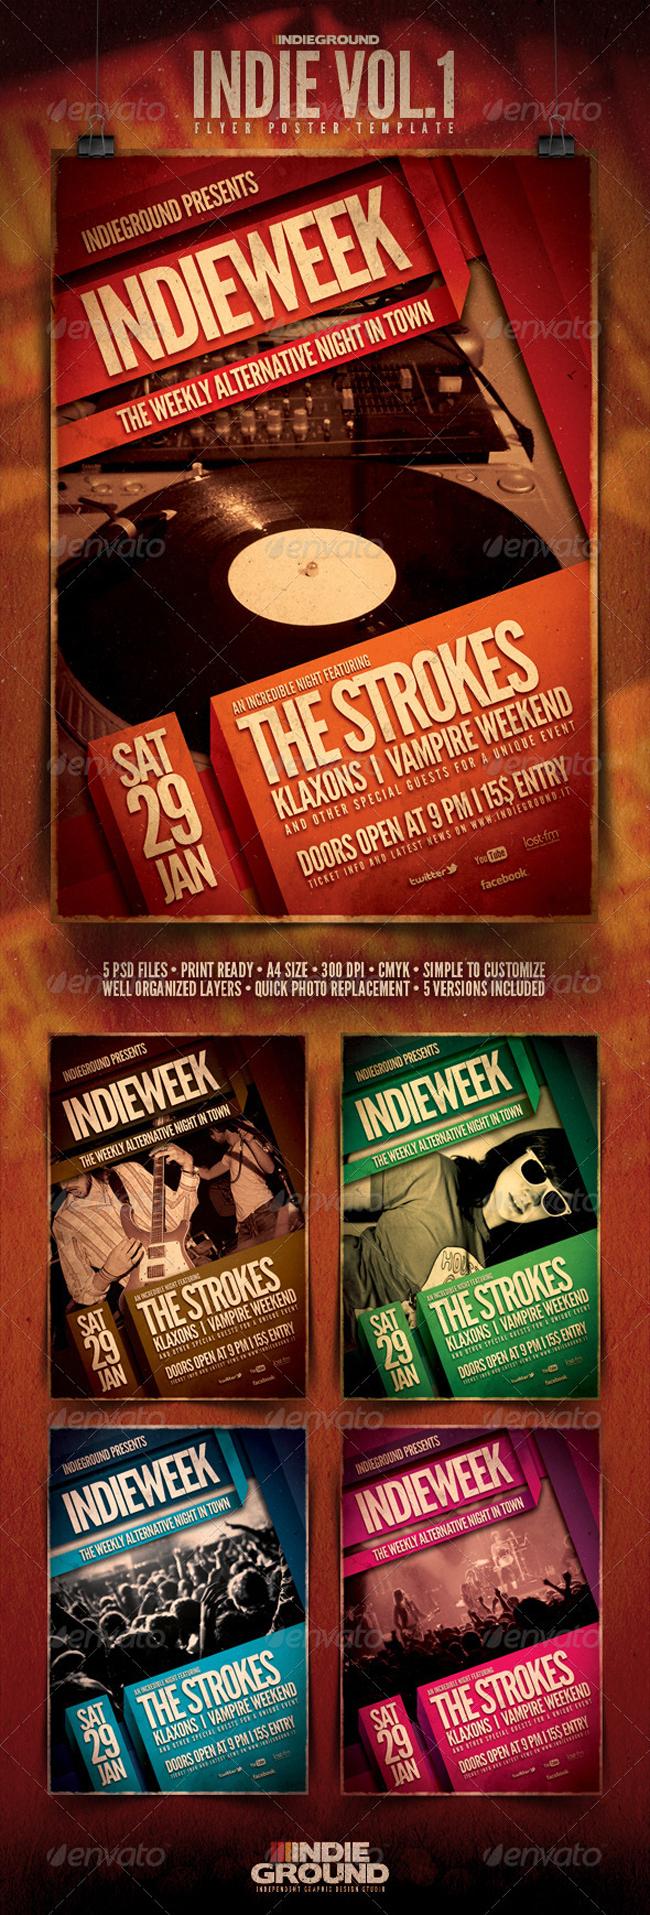 Poster Templates 2 10 Diseños de Posters Increibles